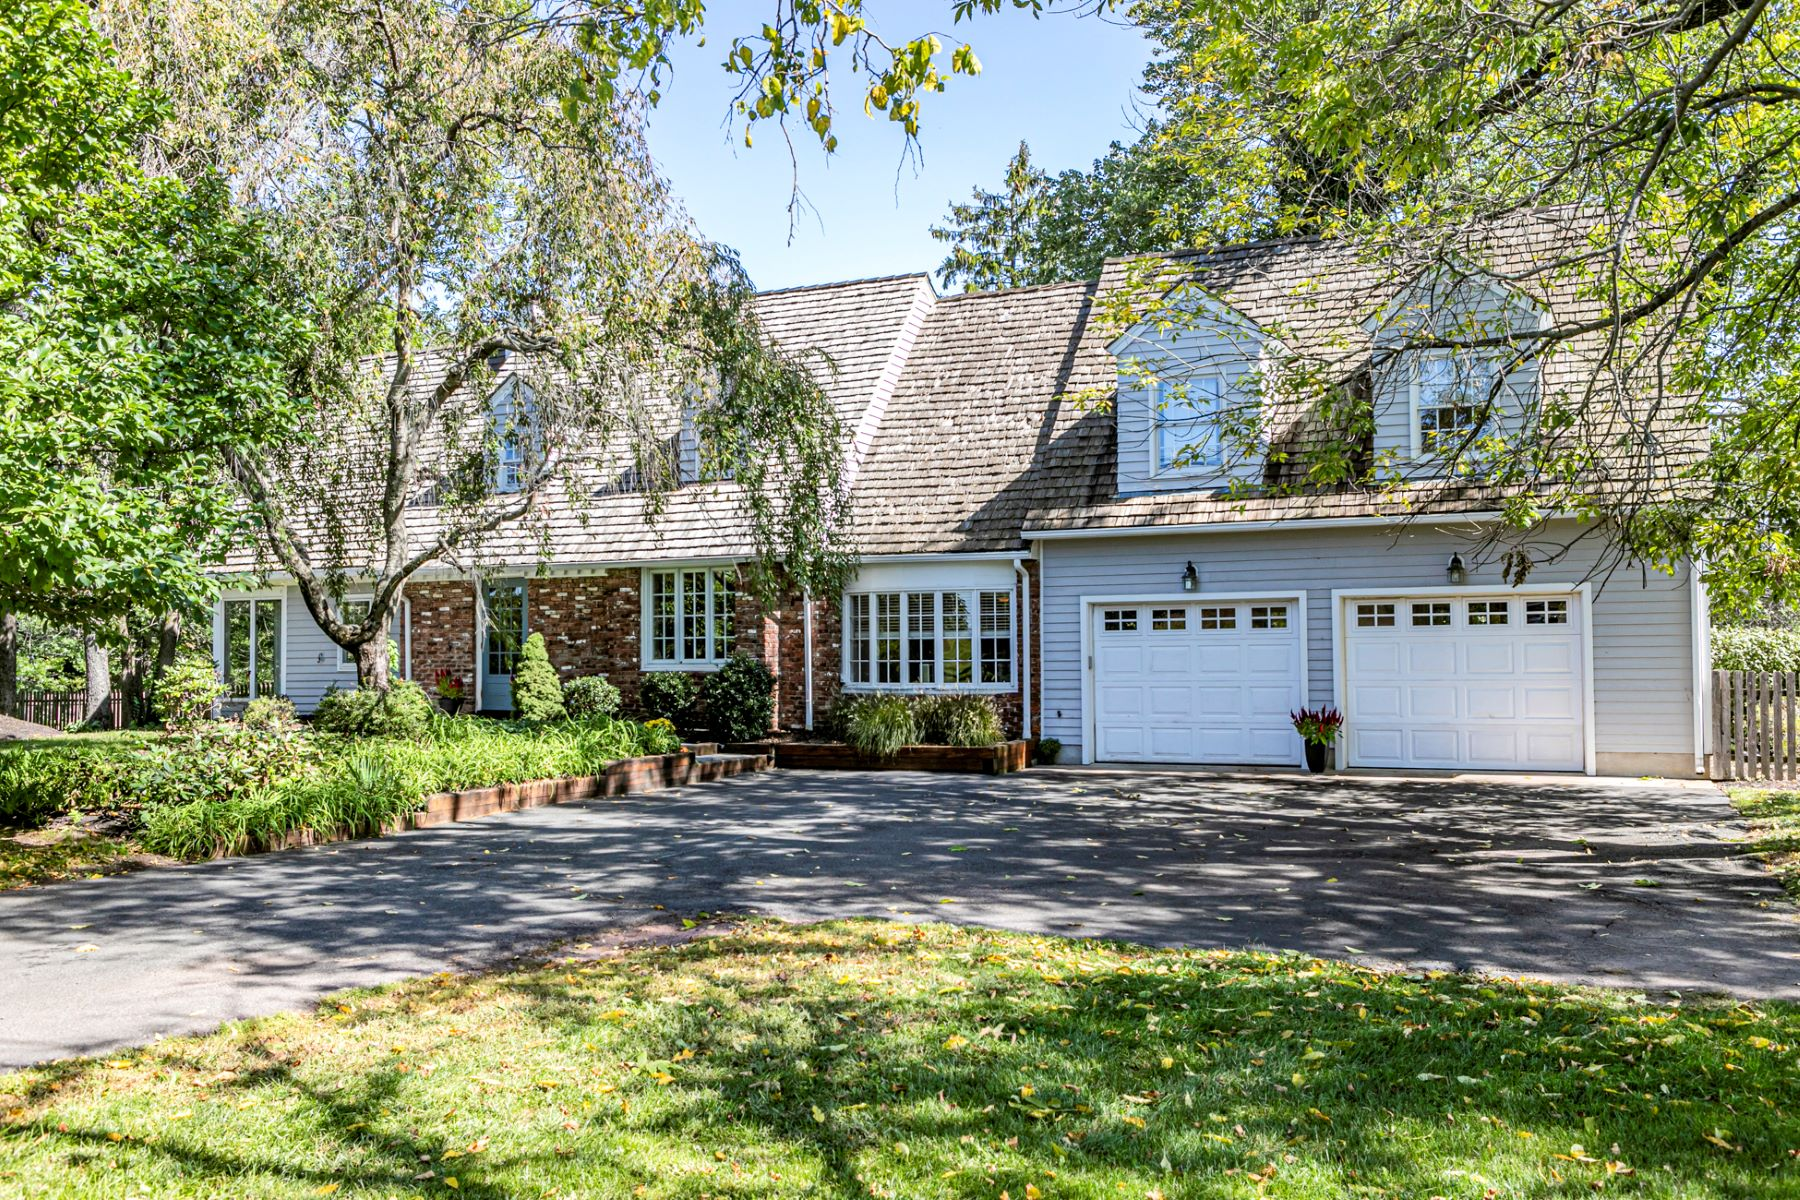 Single Family Homes için Satış at Your Dream Lifestyle Starts Here 341 Province Line Road, Skillman, New Jersey 08558 Amerika Birleşik Devletleri